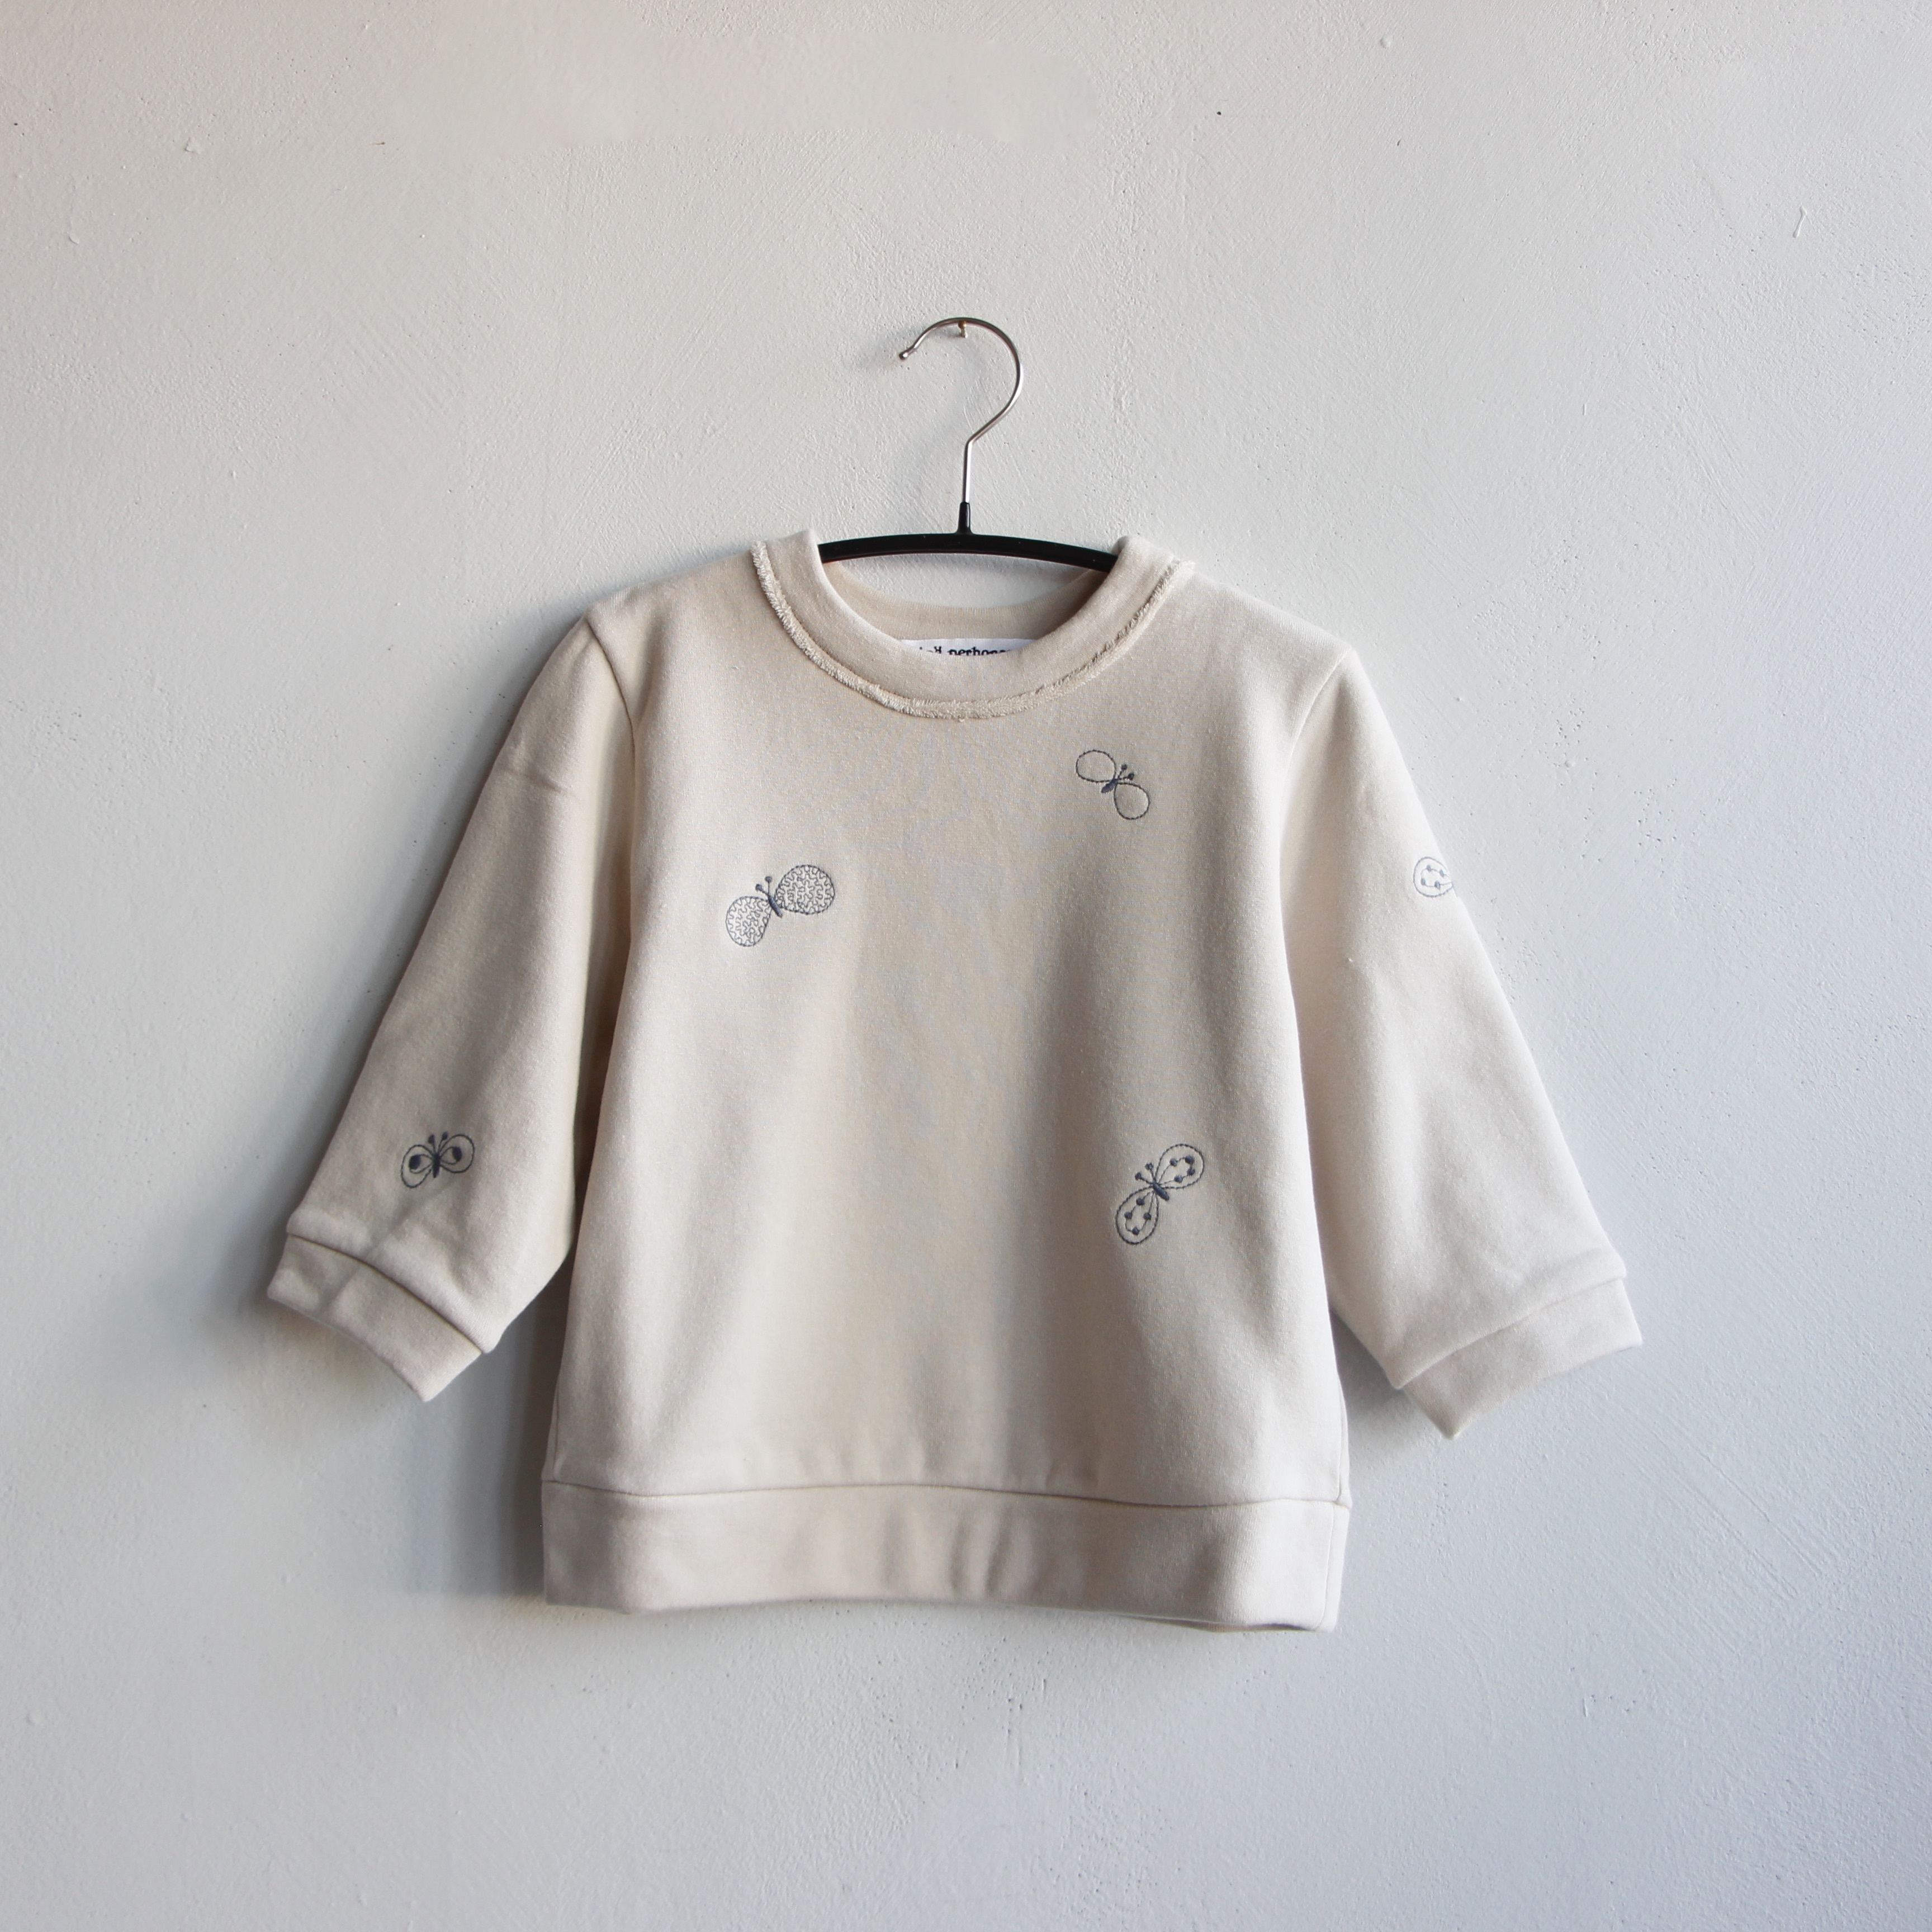 《mina perhonen 2020AW》choucho プルオーバー / beige / 110-120cm